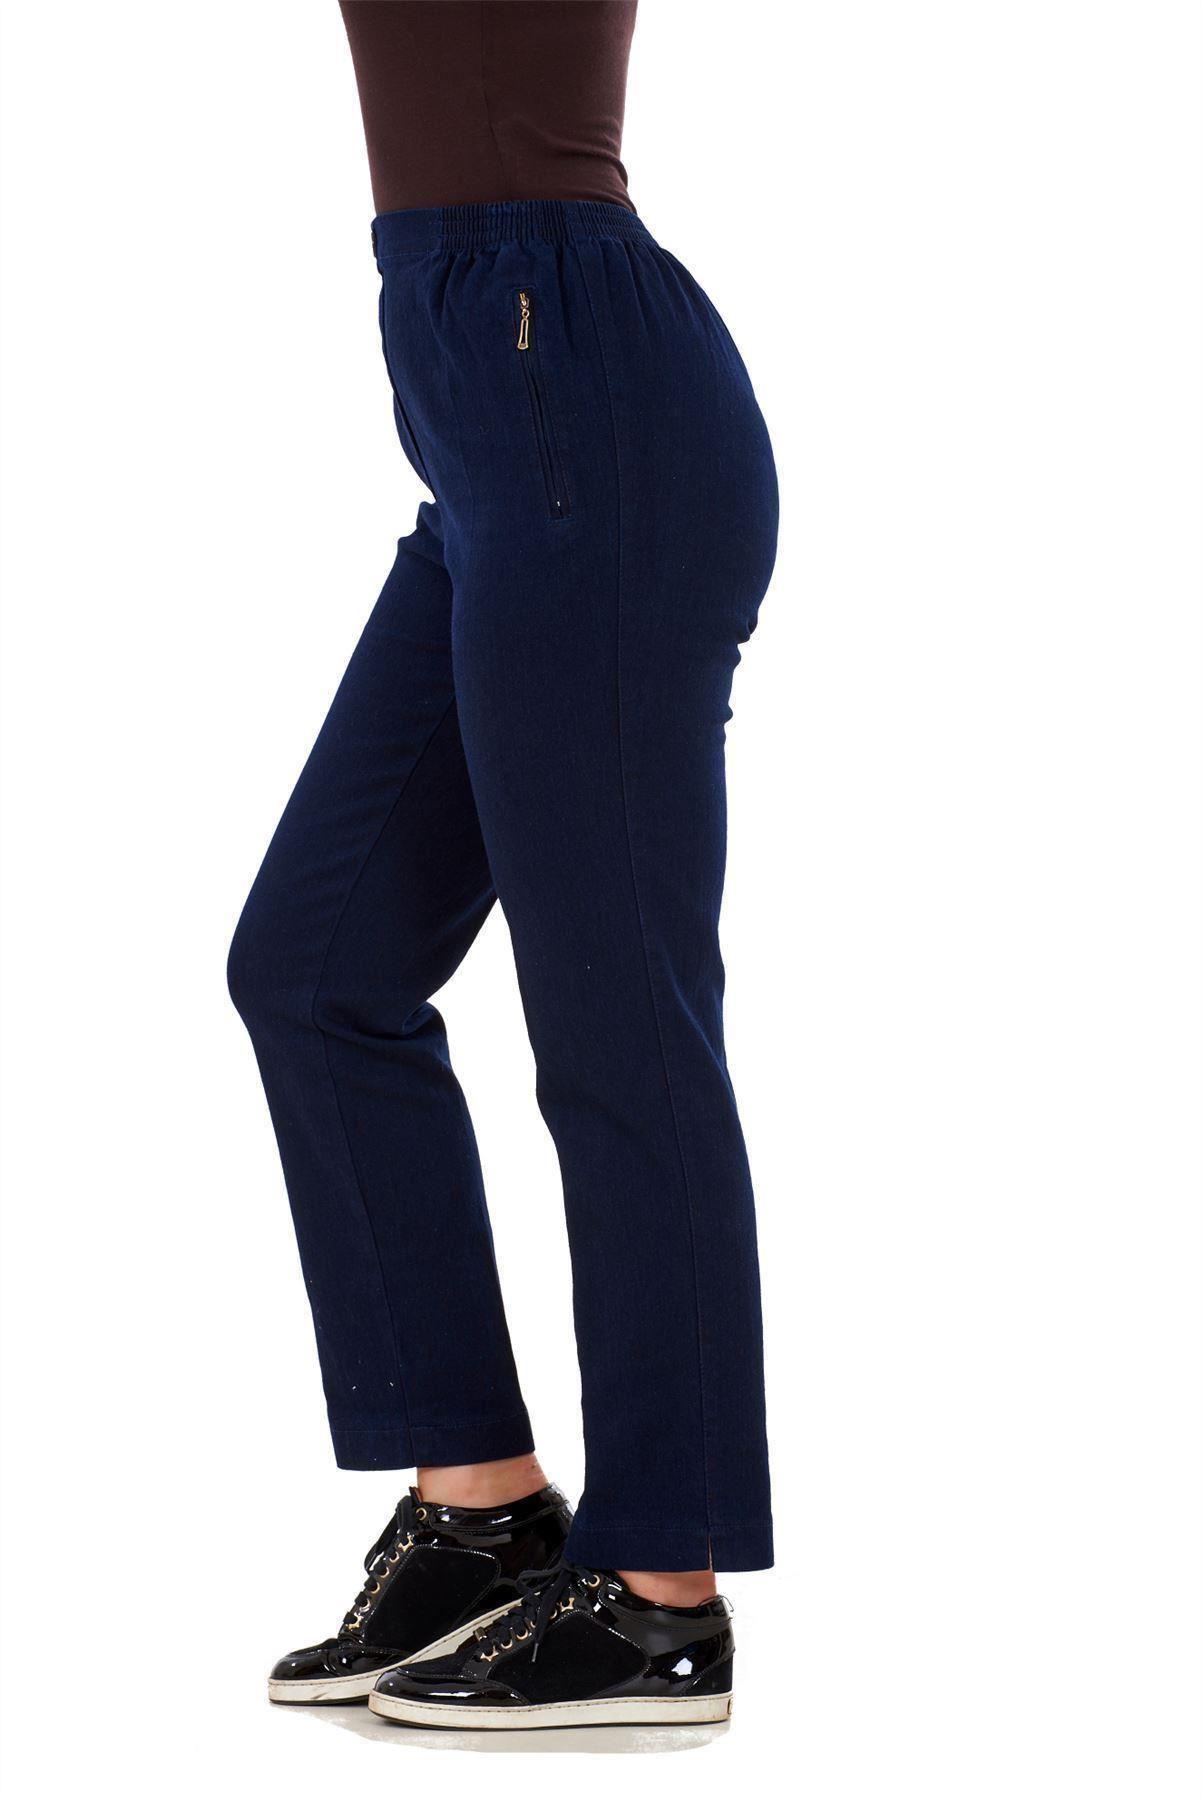 Ladies-Women-Trousers-Rayon-Cotton-Pockets-Elasticated-Stretch-Black-pants-8-24 thumbnail 12